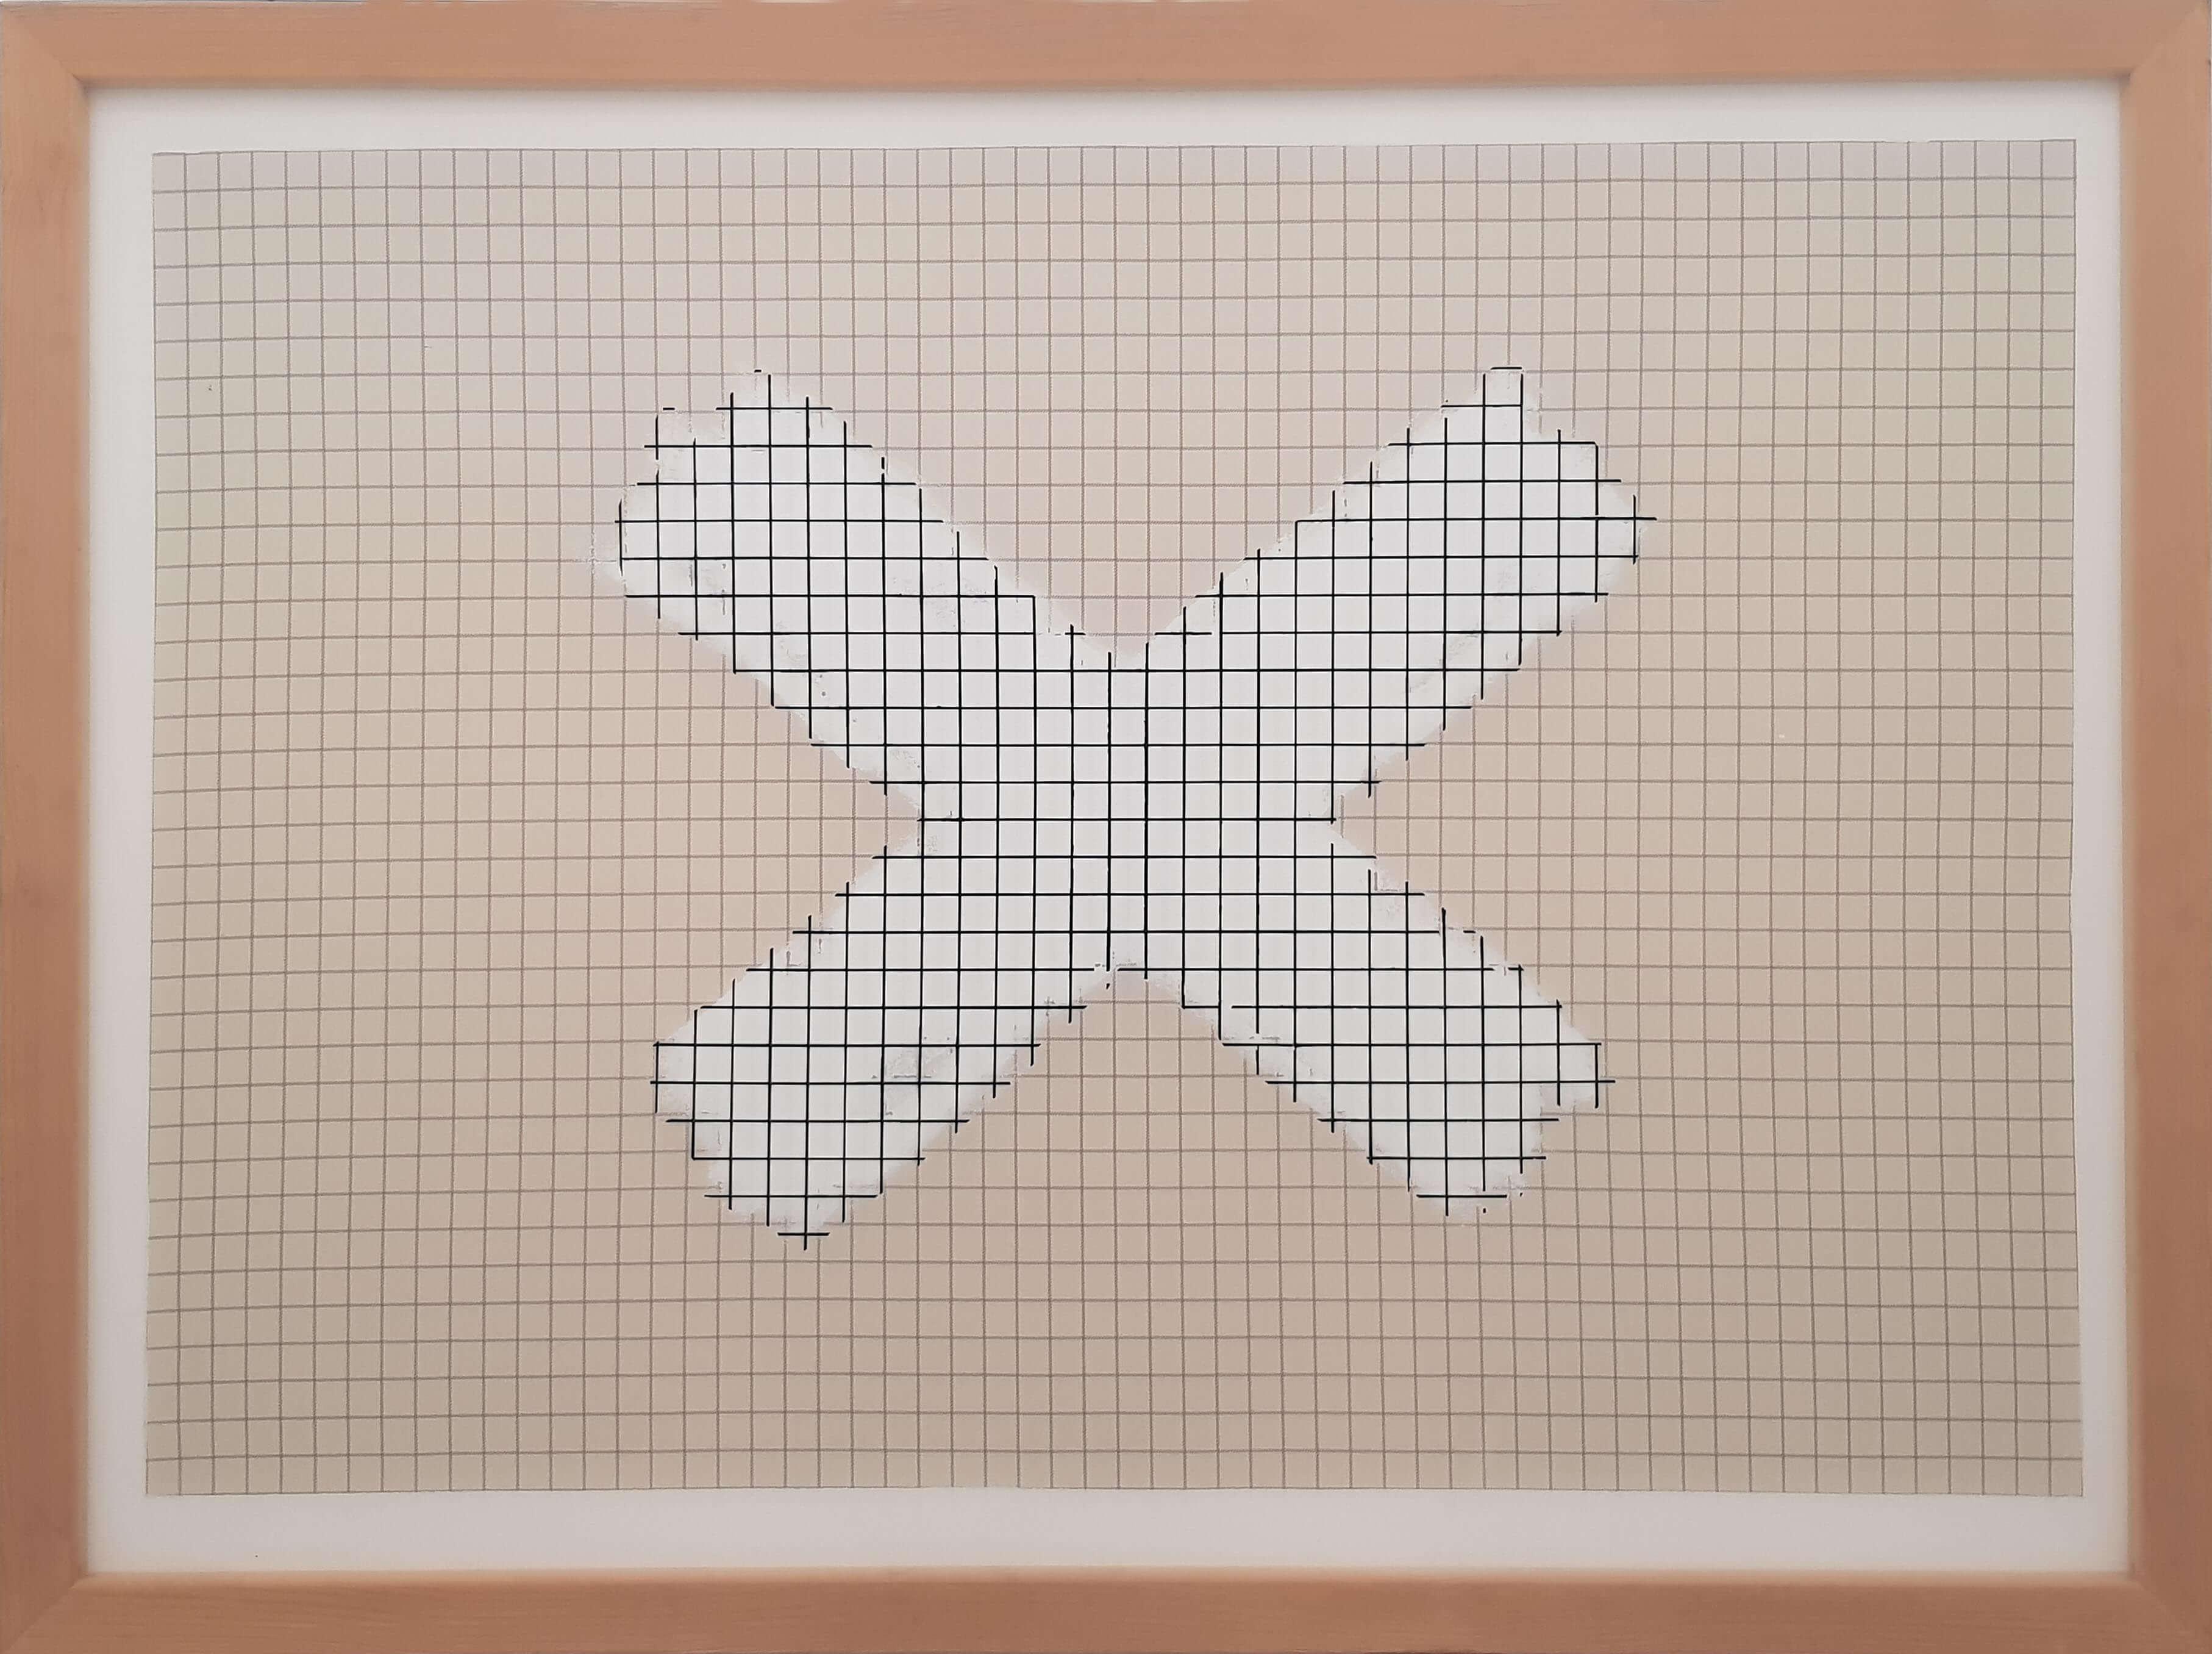 1573_Benni Efrat, Windows, 1974, Mixed media on canvas, 122x91 cm-3628x2712